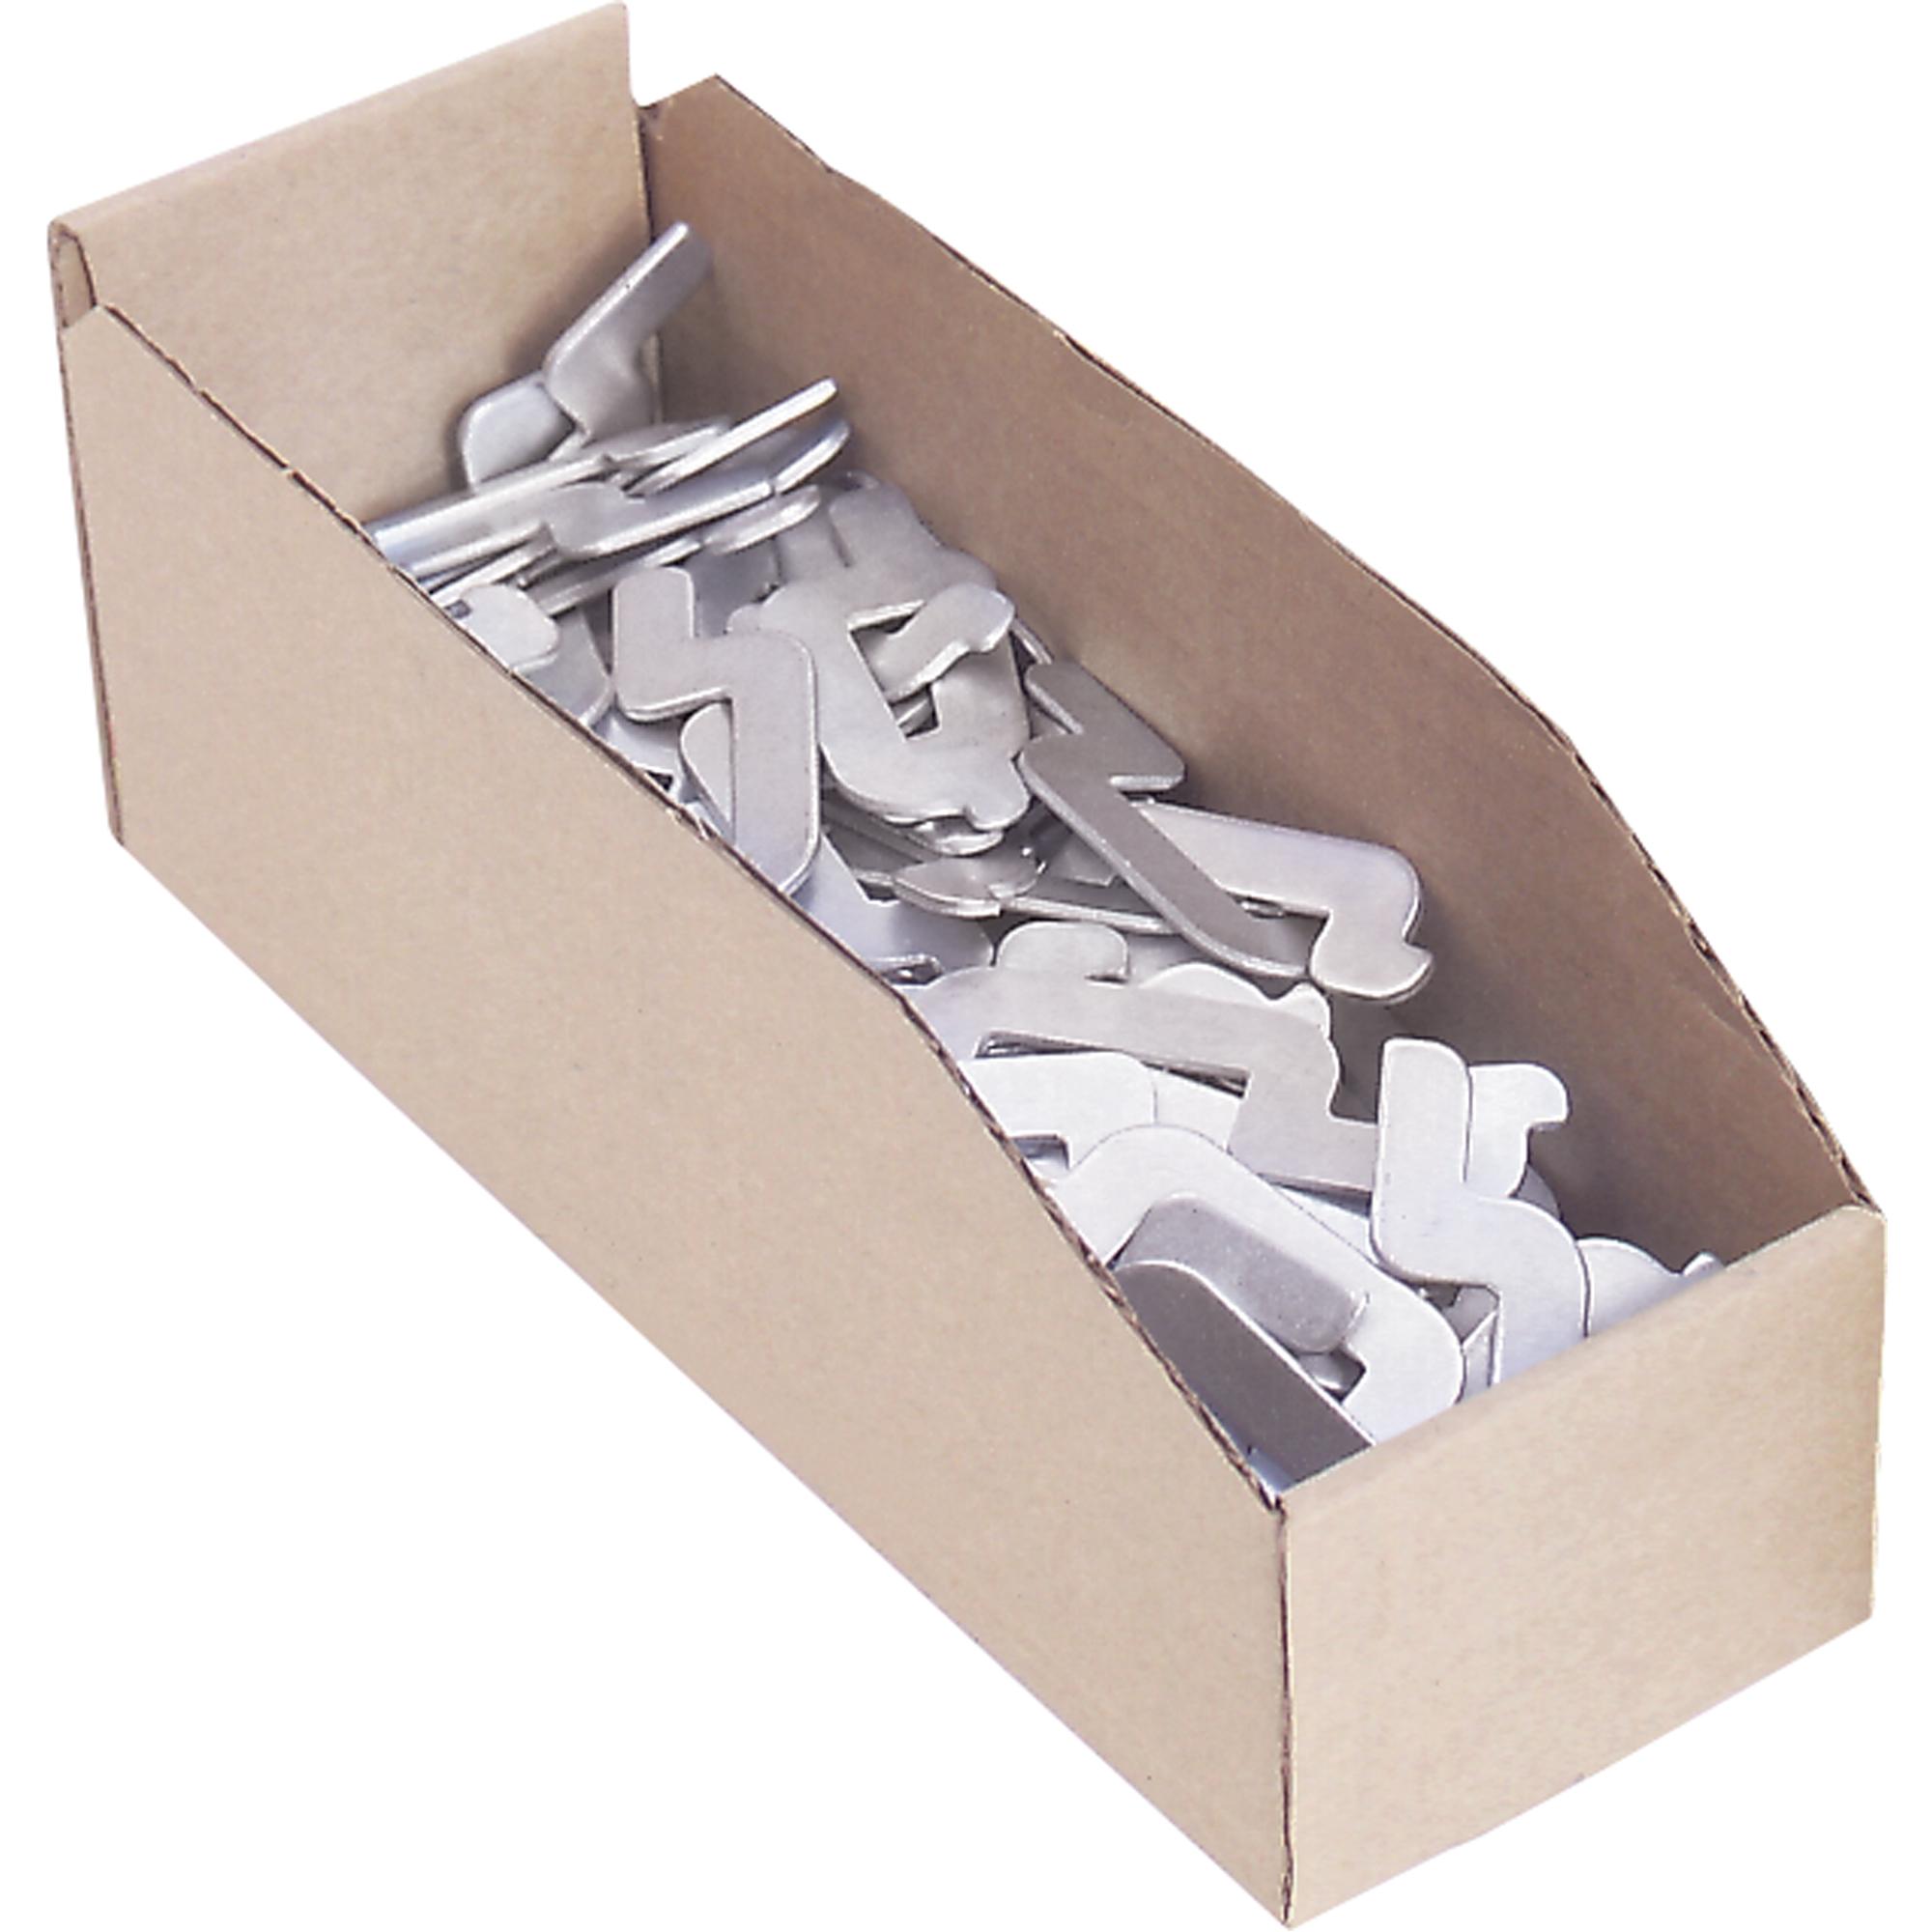 "Cardinal Boxes 12"" Deep Corrugated Parts Bins, 2"" W x 12"" D x 4-1/2"" H, Beige"